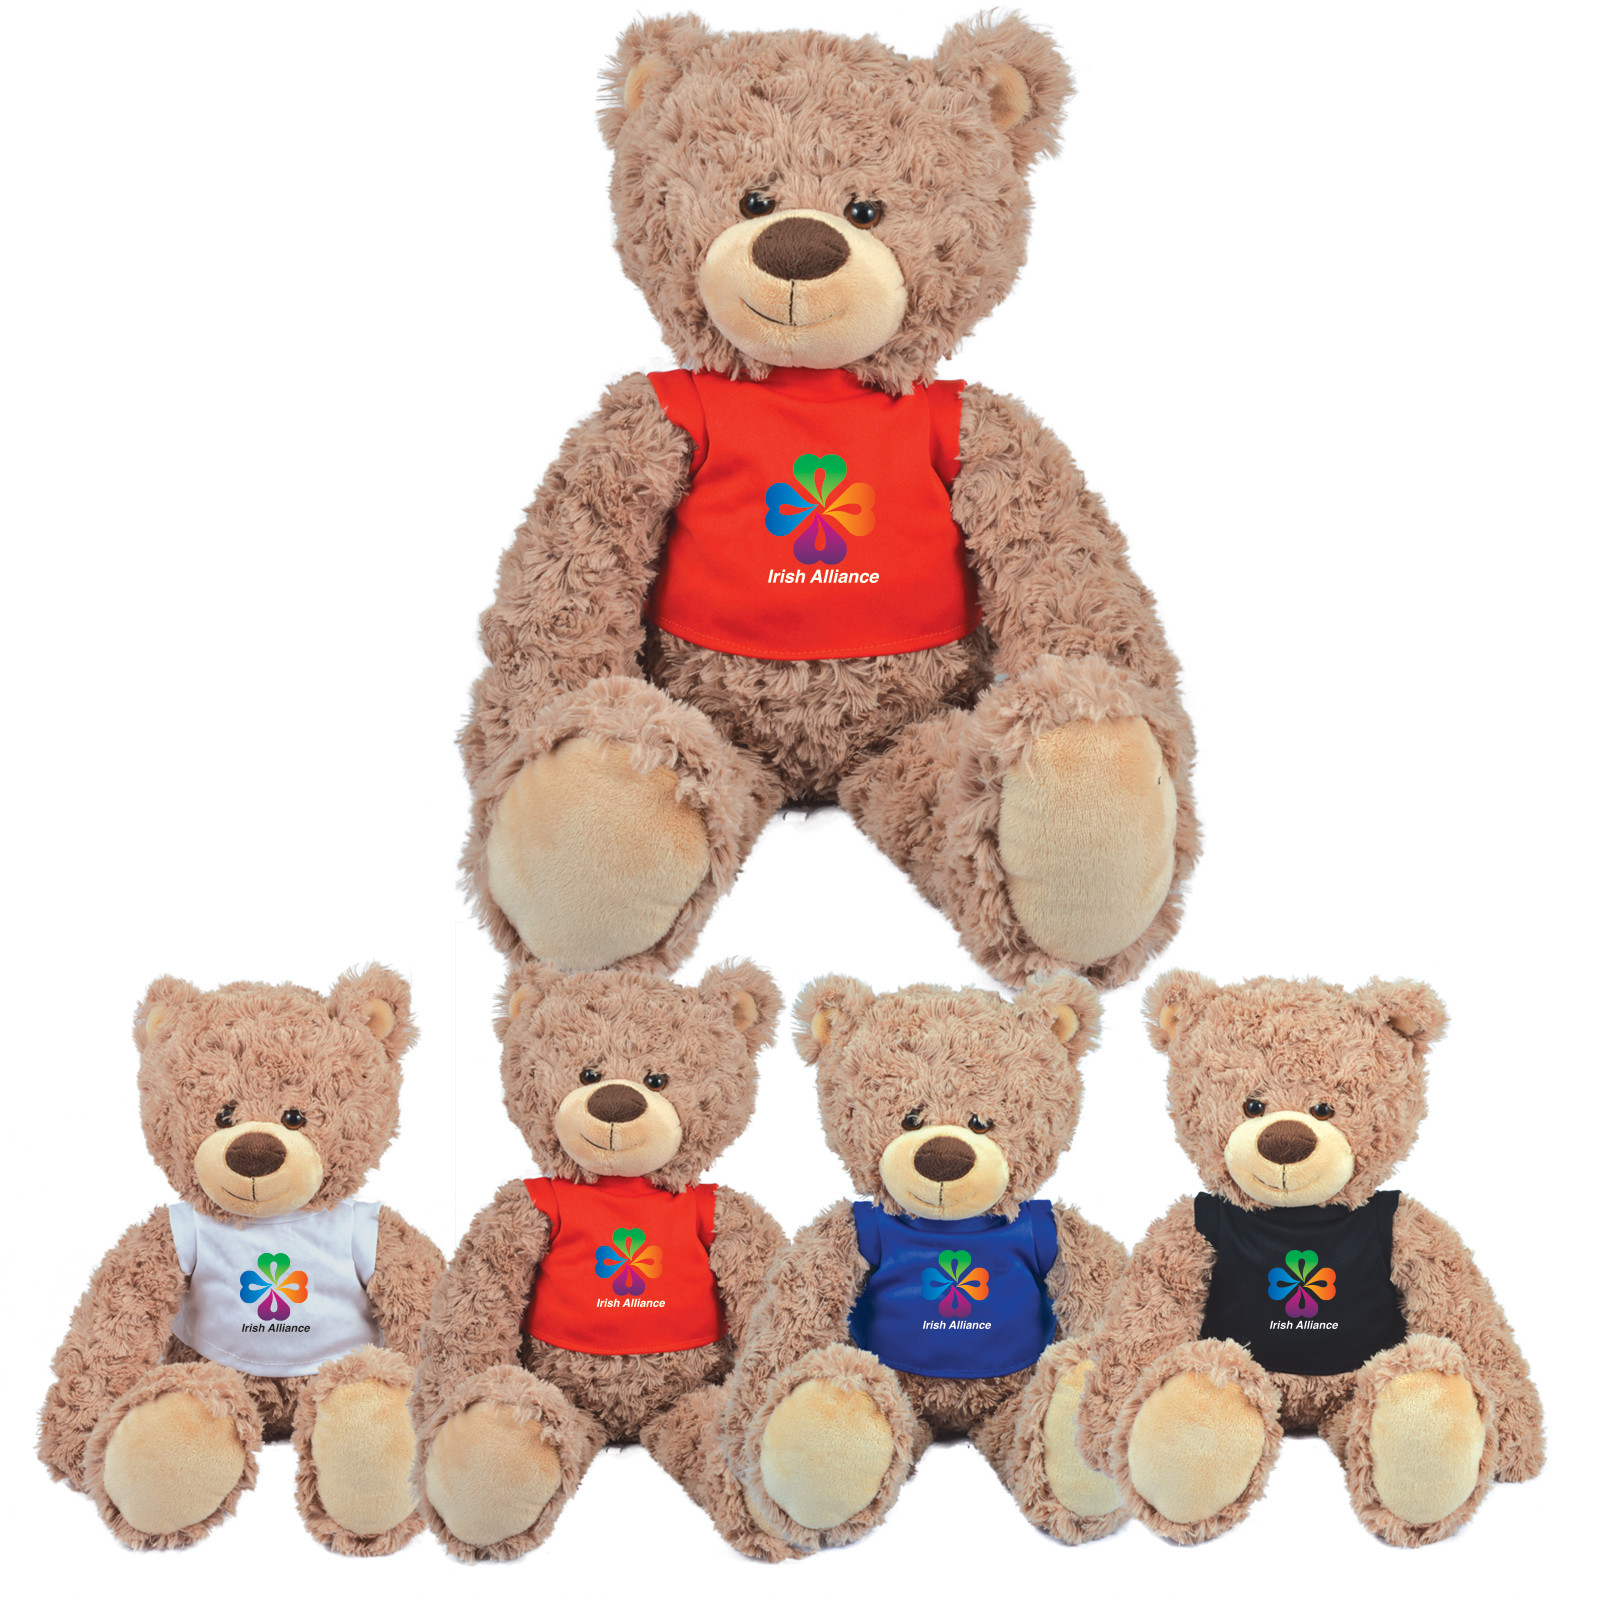 Promotional Product Bailey Plush Bear